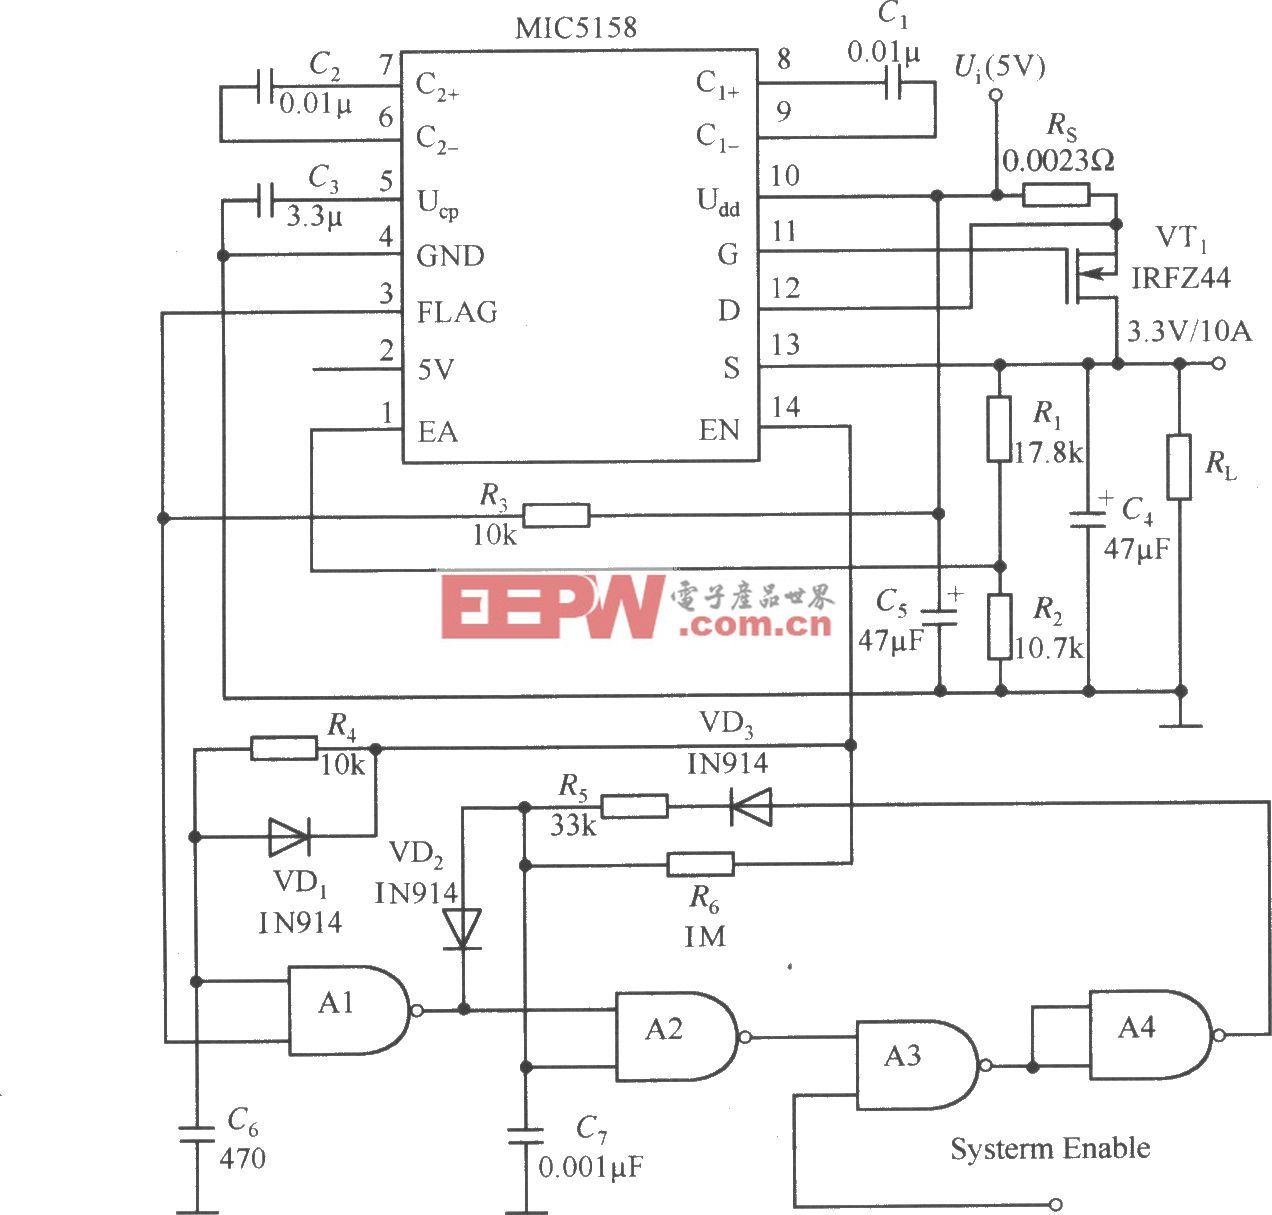 MIC5158与一些其他器件构成的5V输入、3.3V/10A输出并且具有短路保护功能的线性稳压器电路